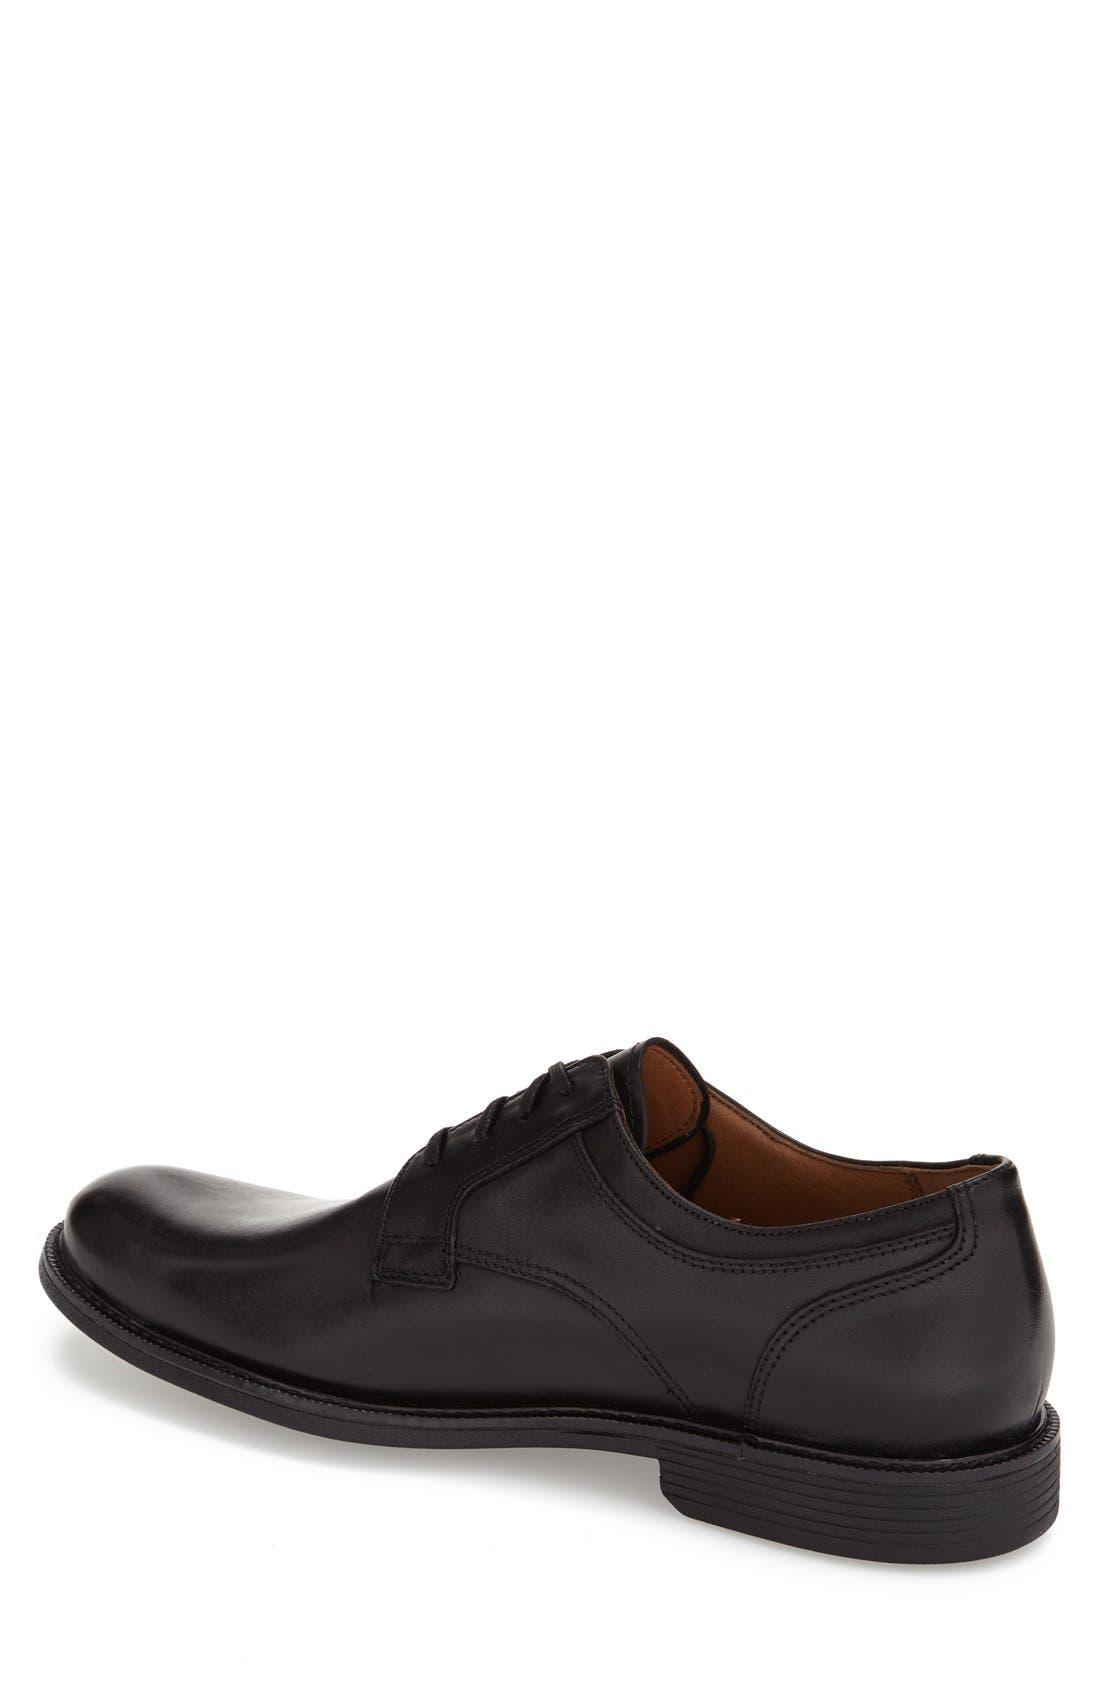 'Cardell' Plain Toe Derby,                             Alternate thumbnail 2, color,                             002